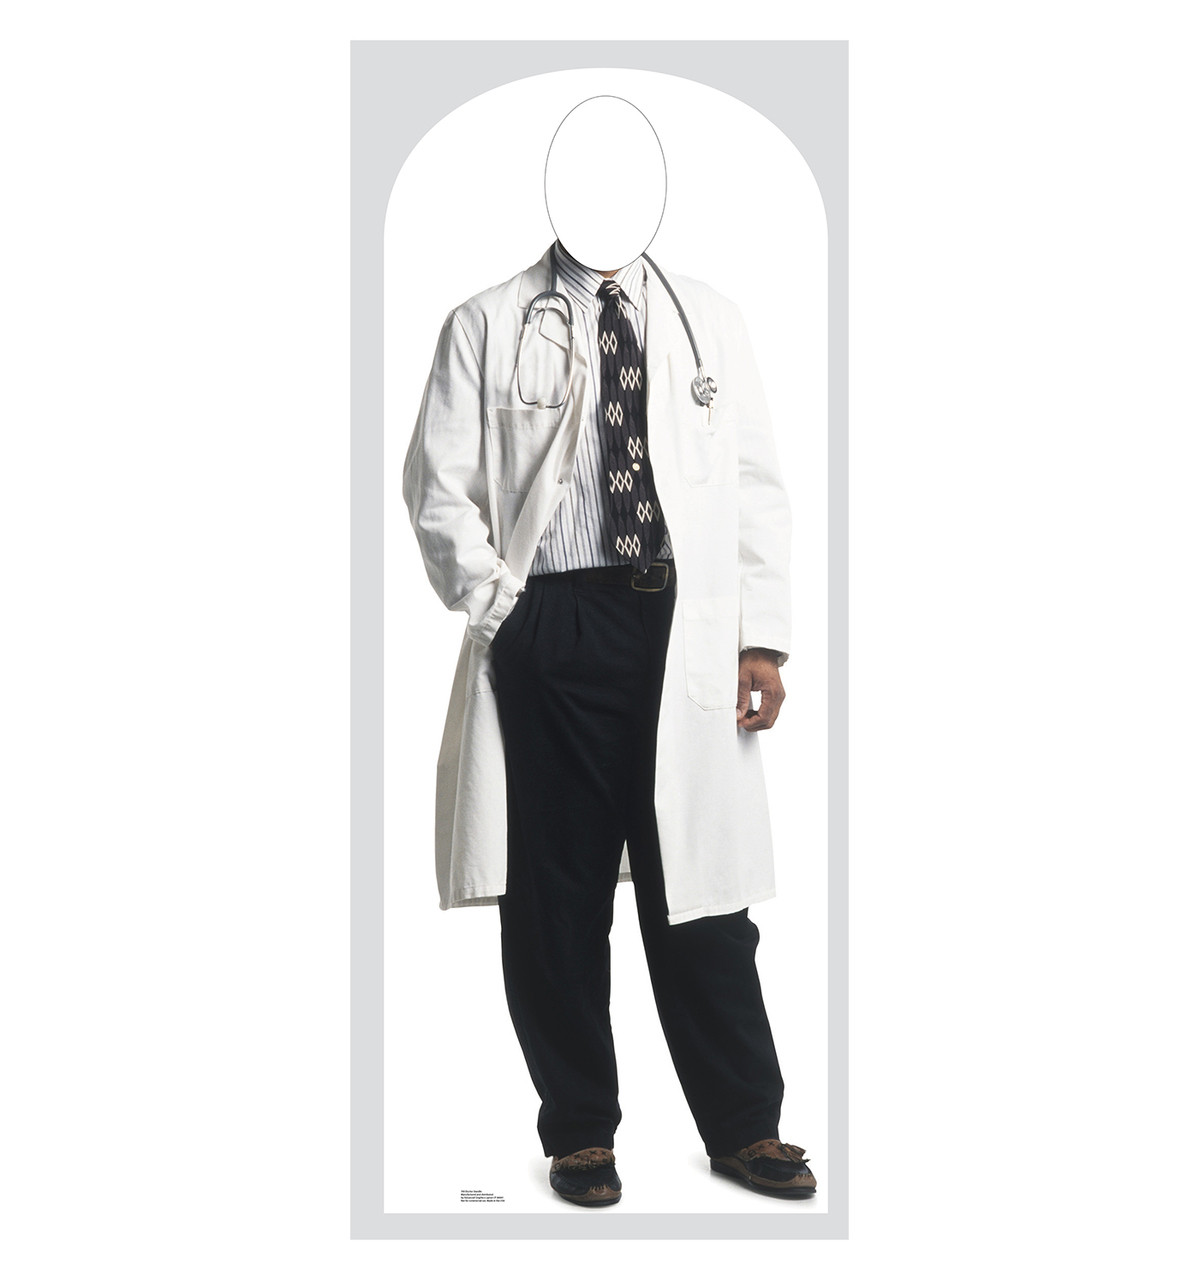 Life-size Doctor Stand-in Cardboard Standup | Cardboard Cutout